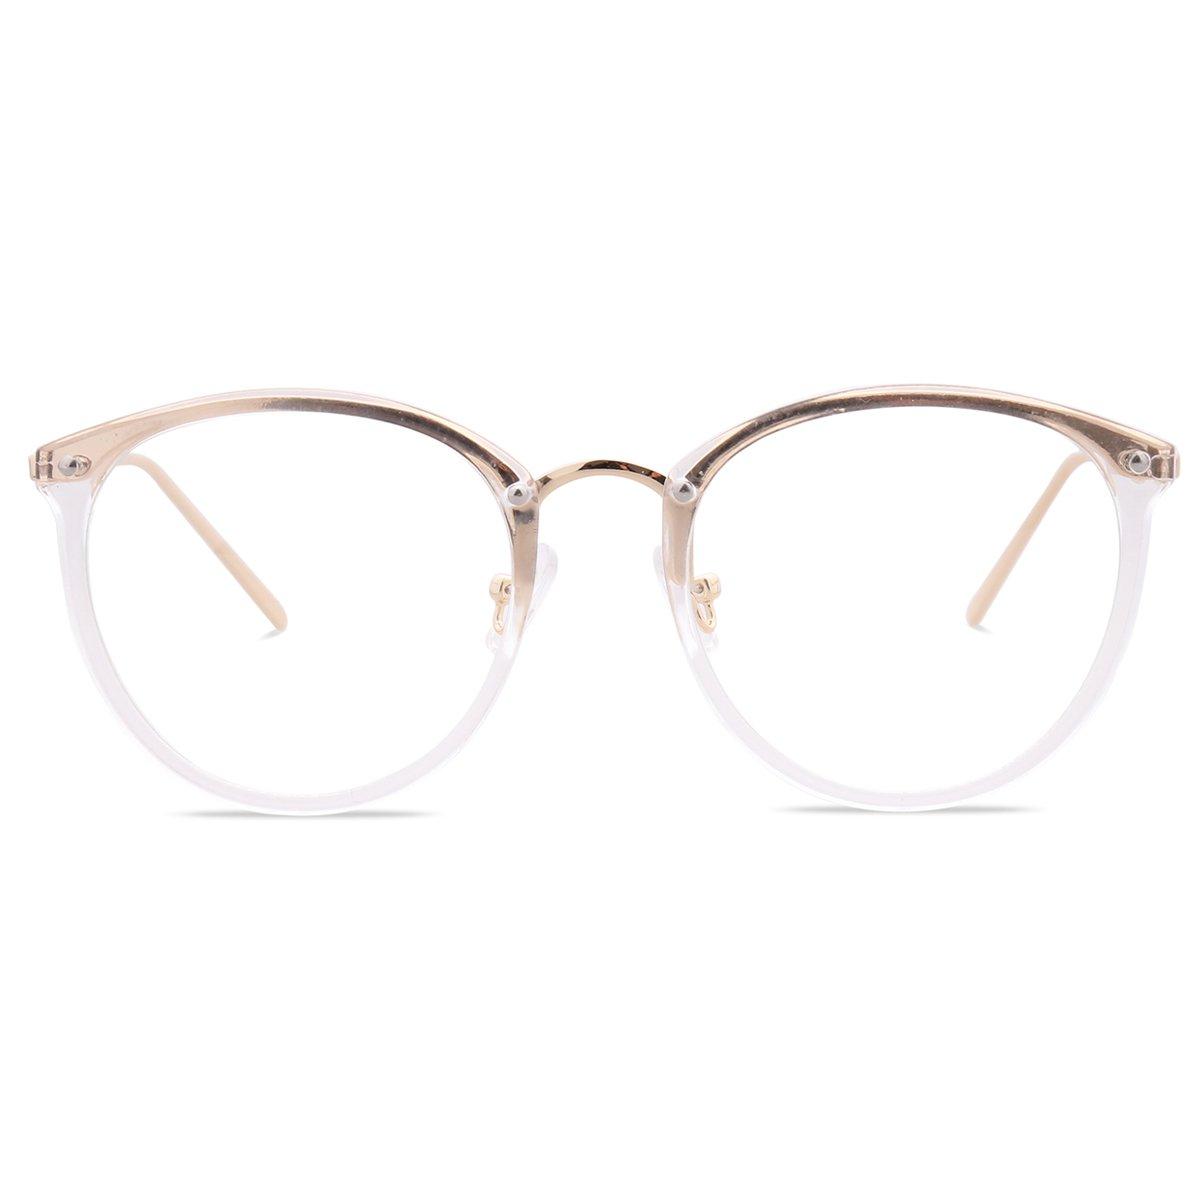 Amomoma Women's Fashion Round Eyeglasses Optical Frame Clear Lens Eyewear AM5001 (C7 Transparent/Gold, 50)